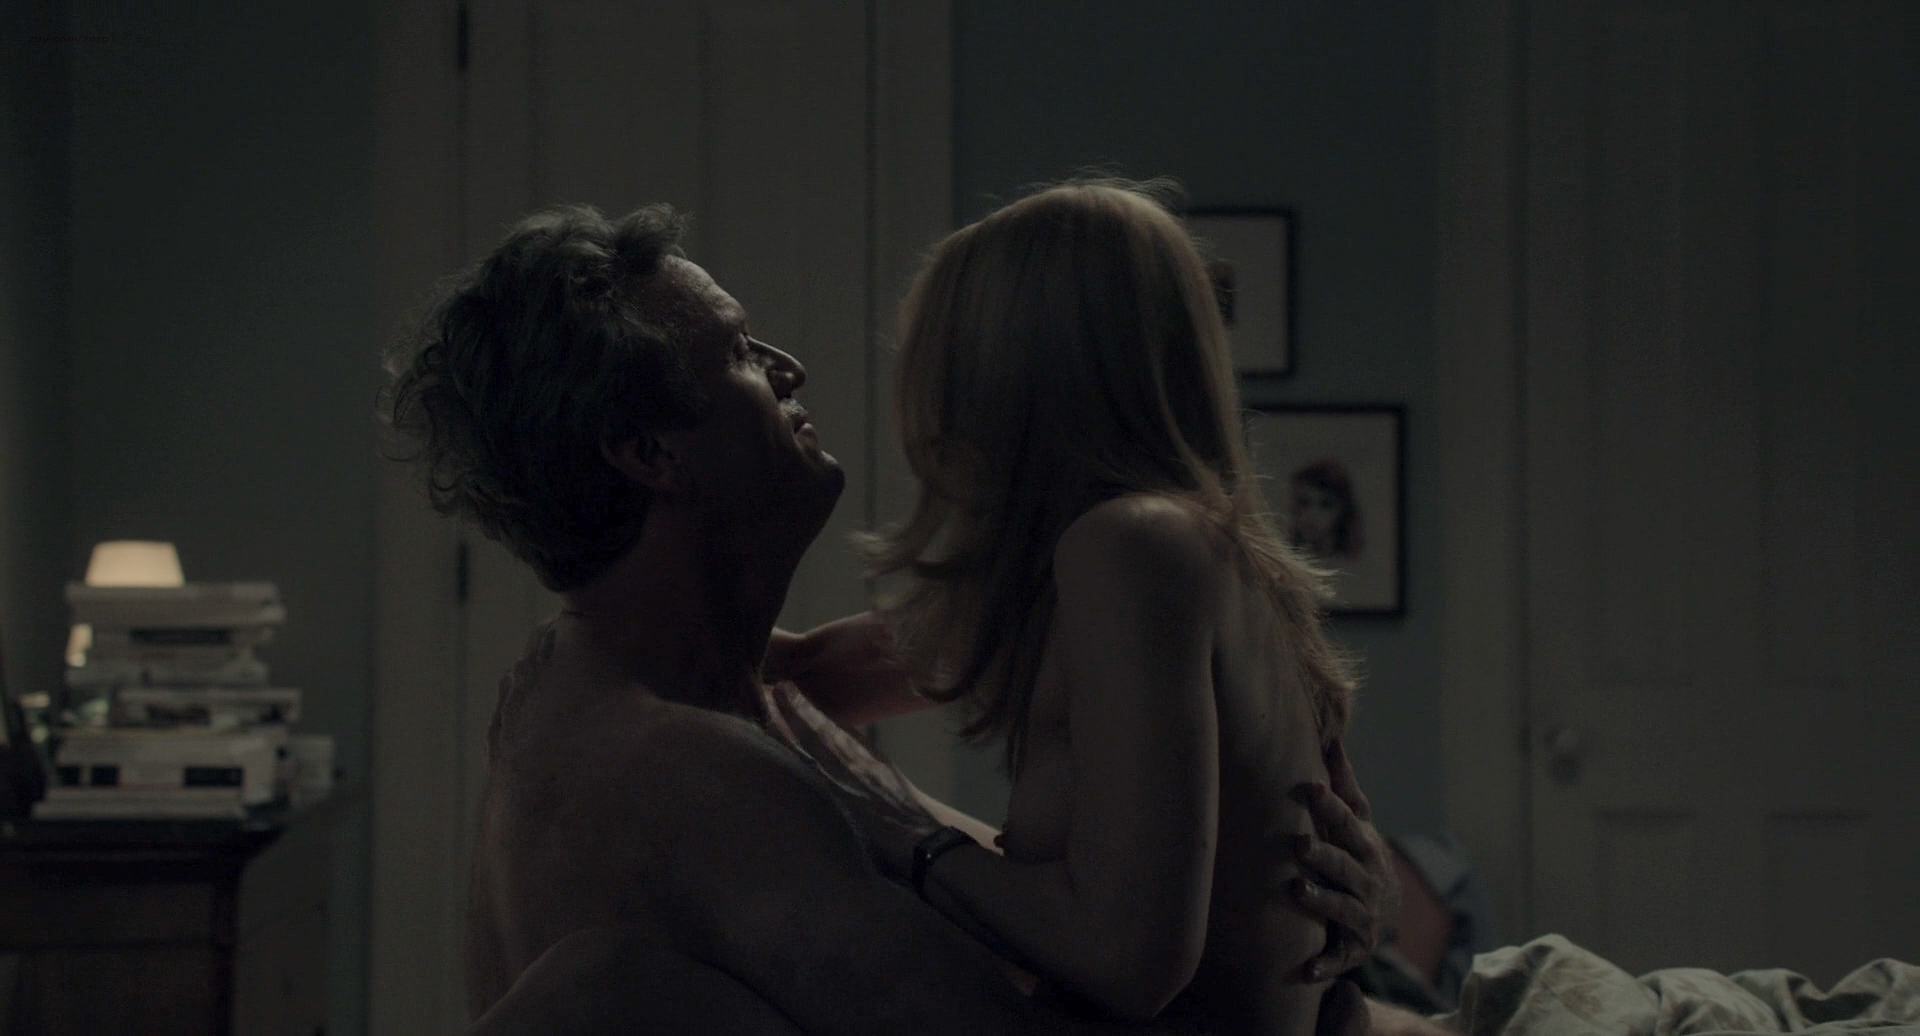 Patricia clarkson topless, nude neha girl